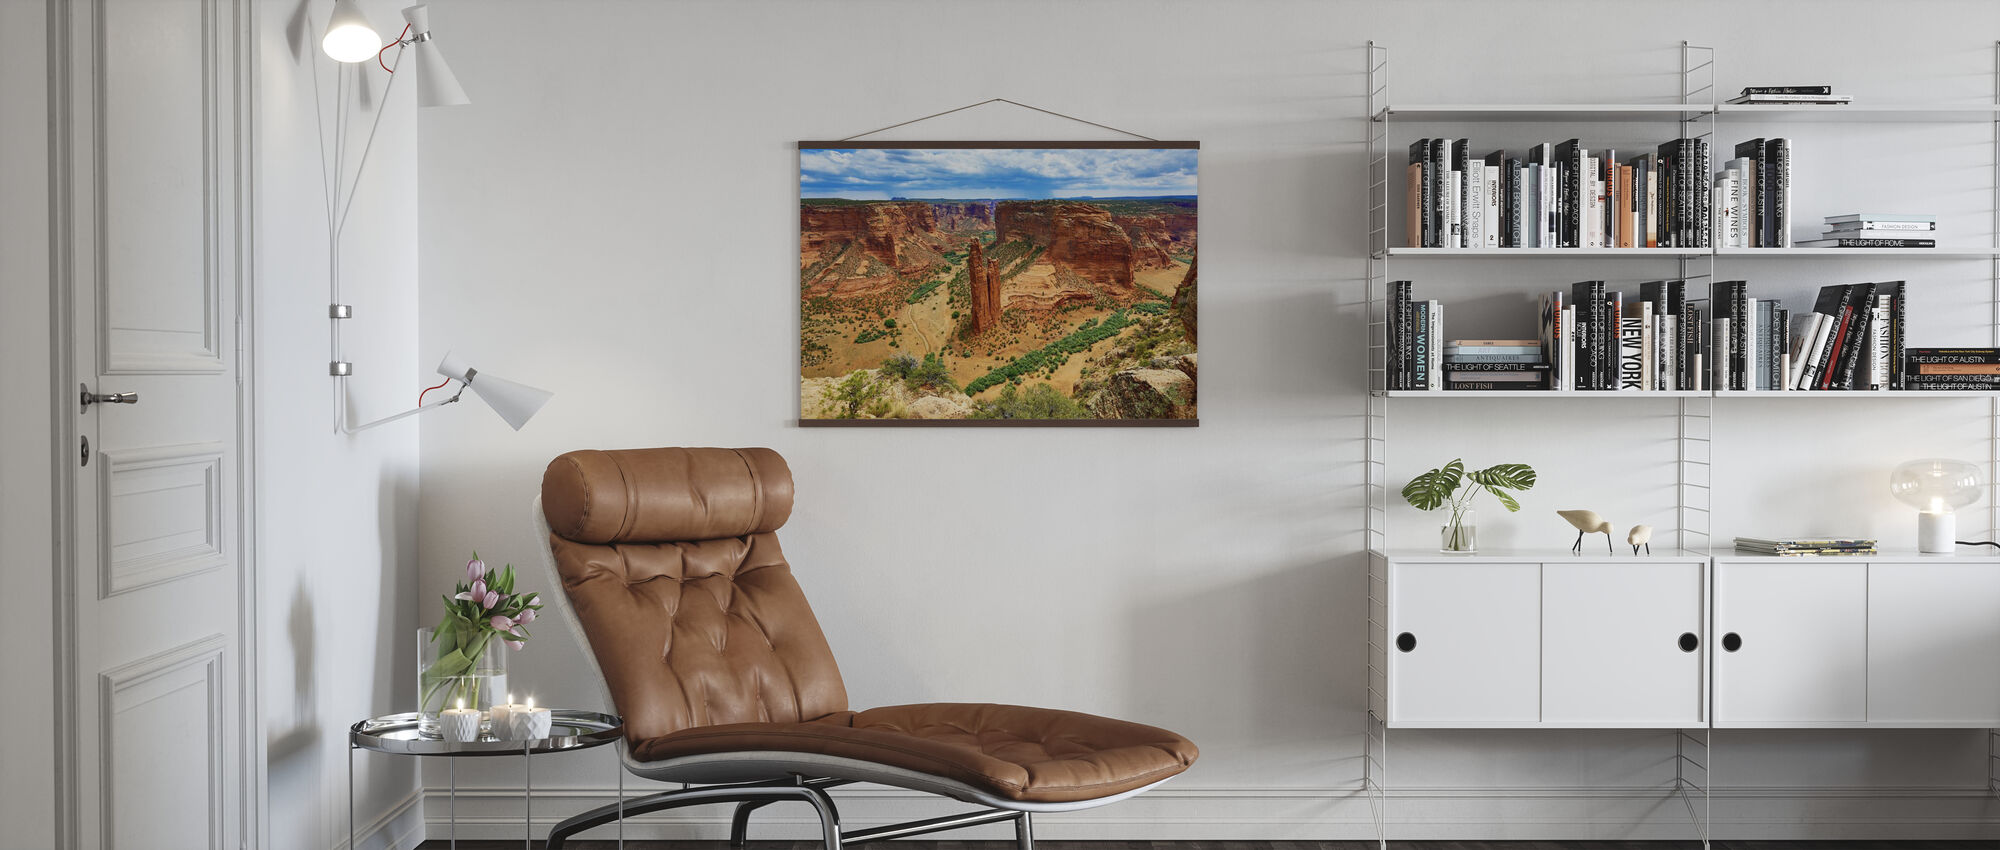 De Chelly Sandstone - Plakat - Stue